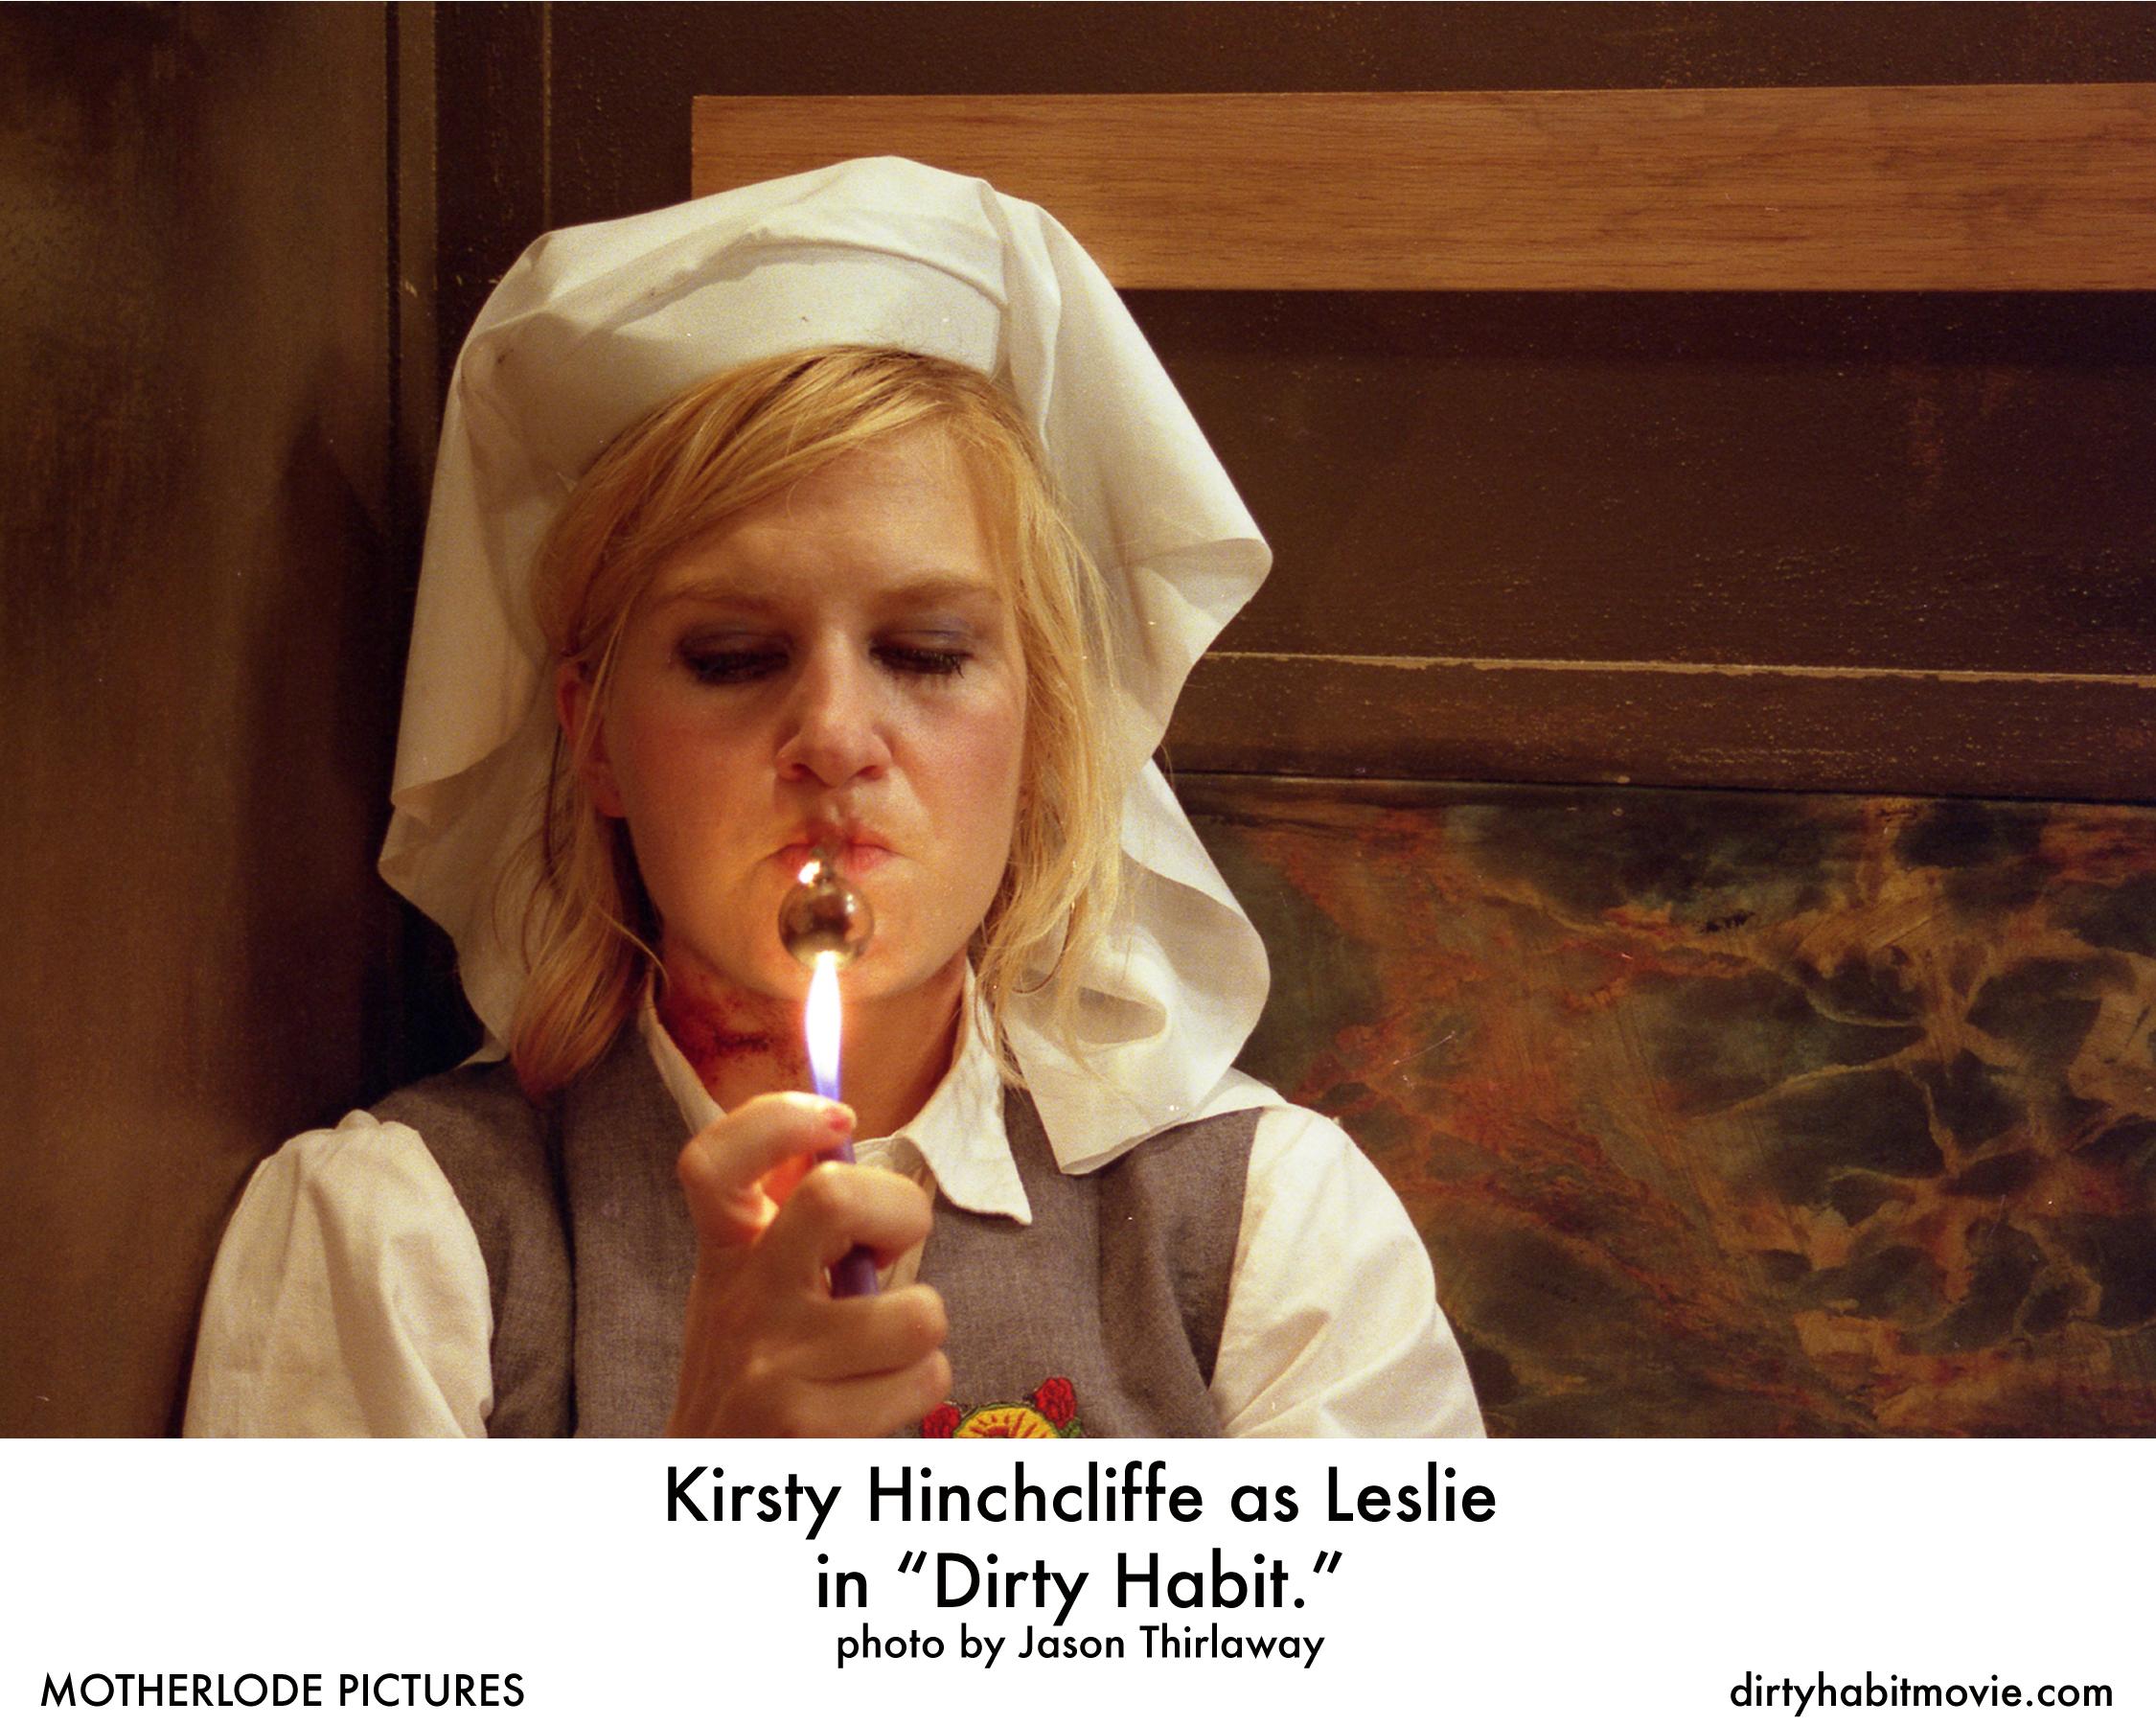 kirsty hinchcliffe gossip